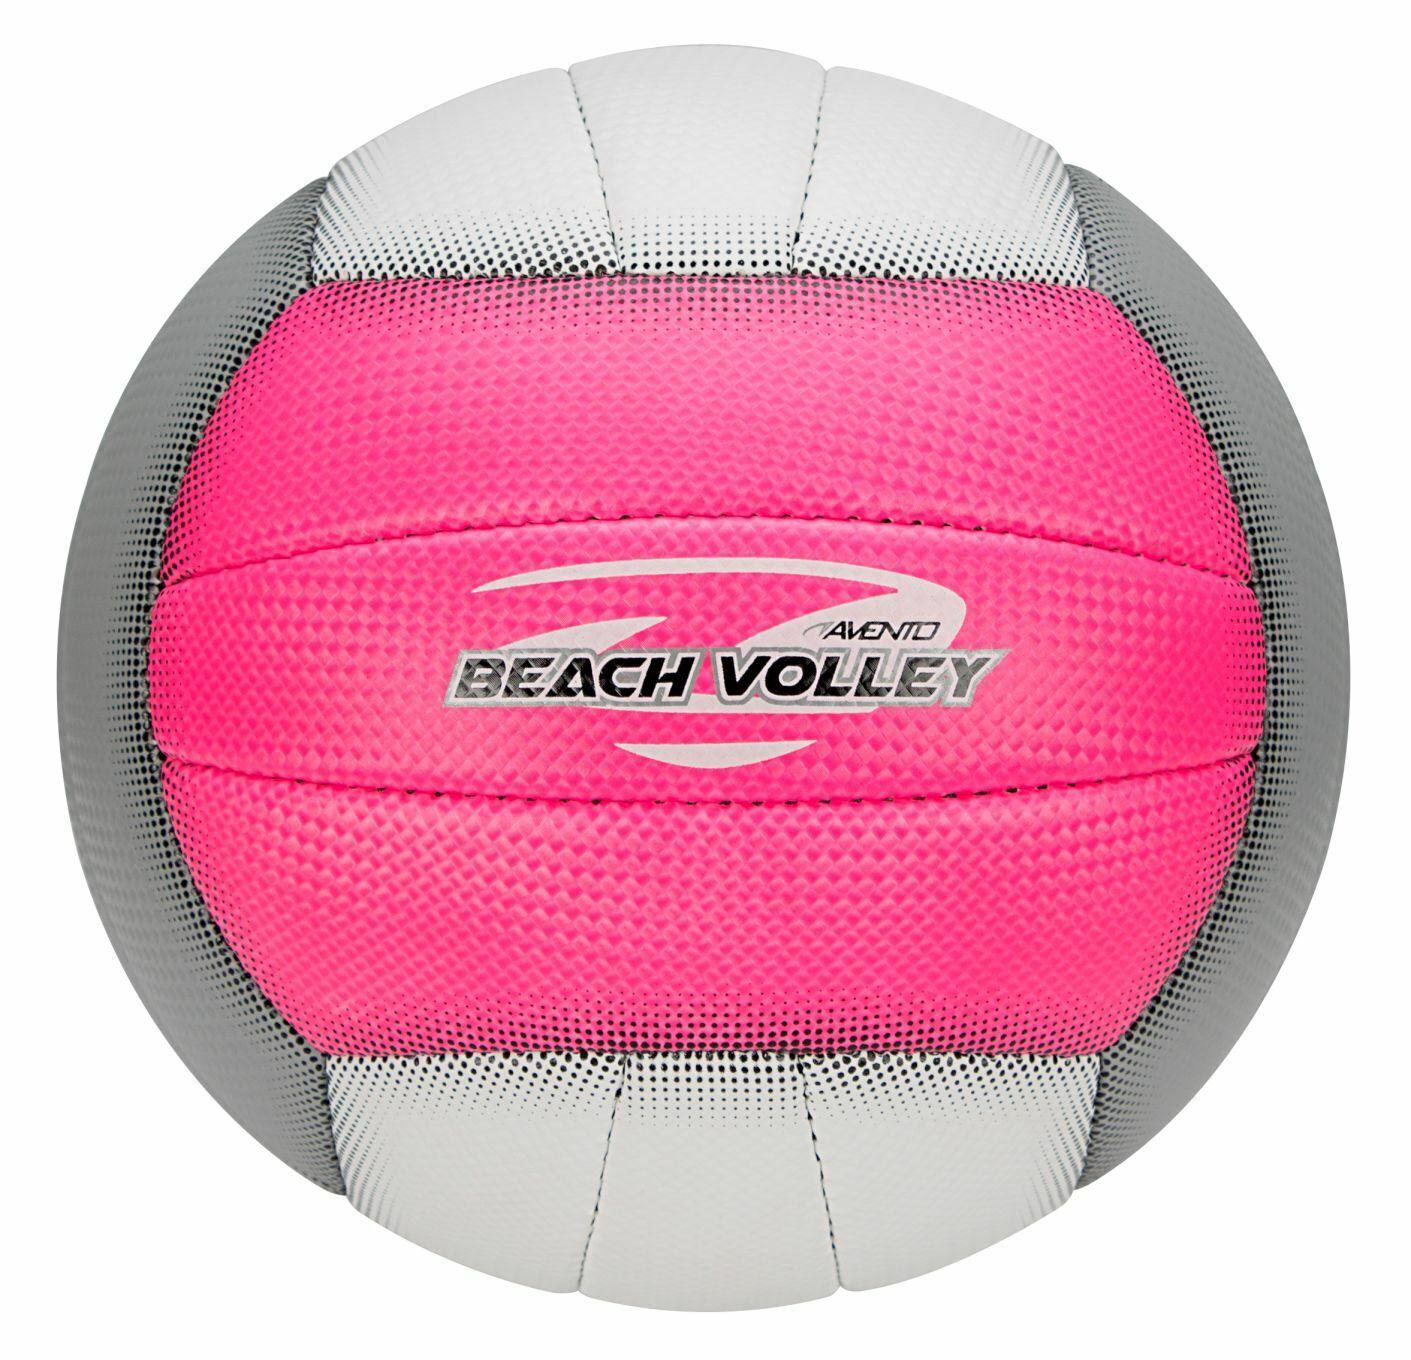 Avento Strandvolleyball Soft Touch Jump-floater Rosa/Weiß/Grau